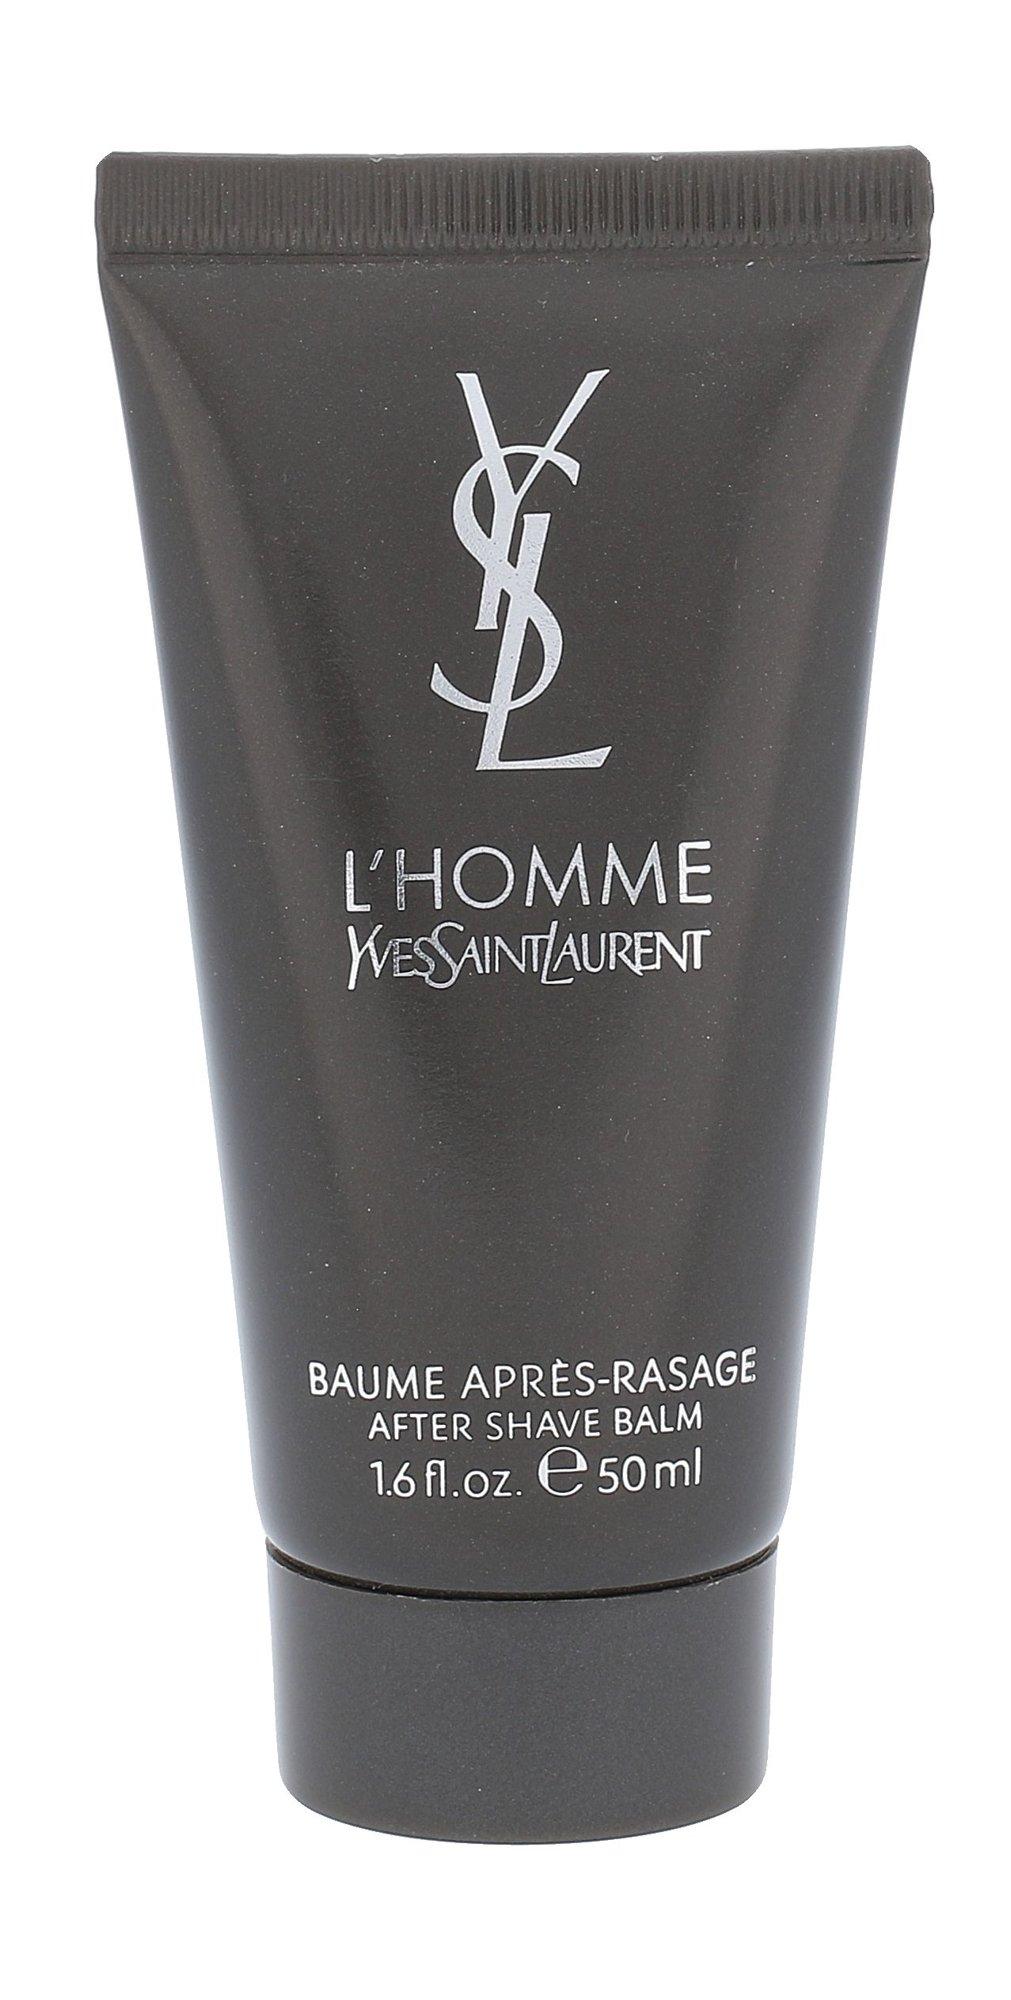 Yves Saint Laurent L´Homme After shave balm 50ml